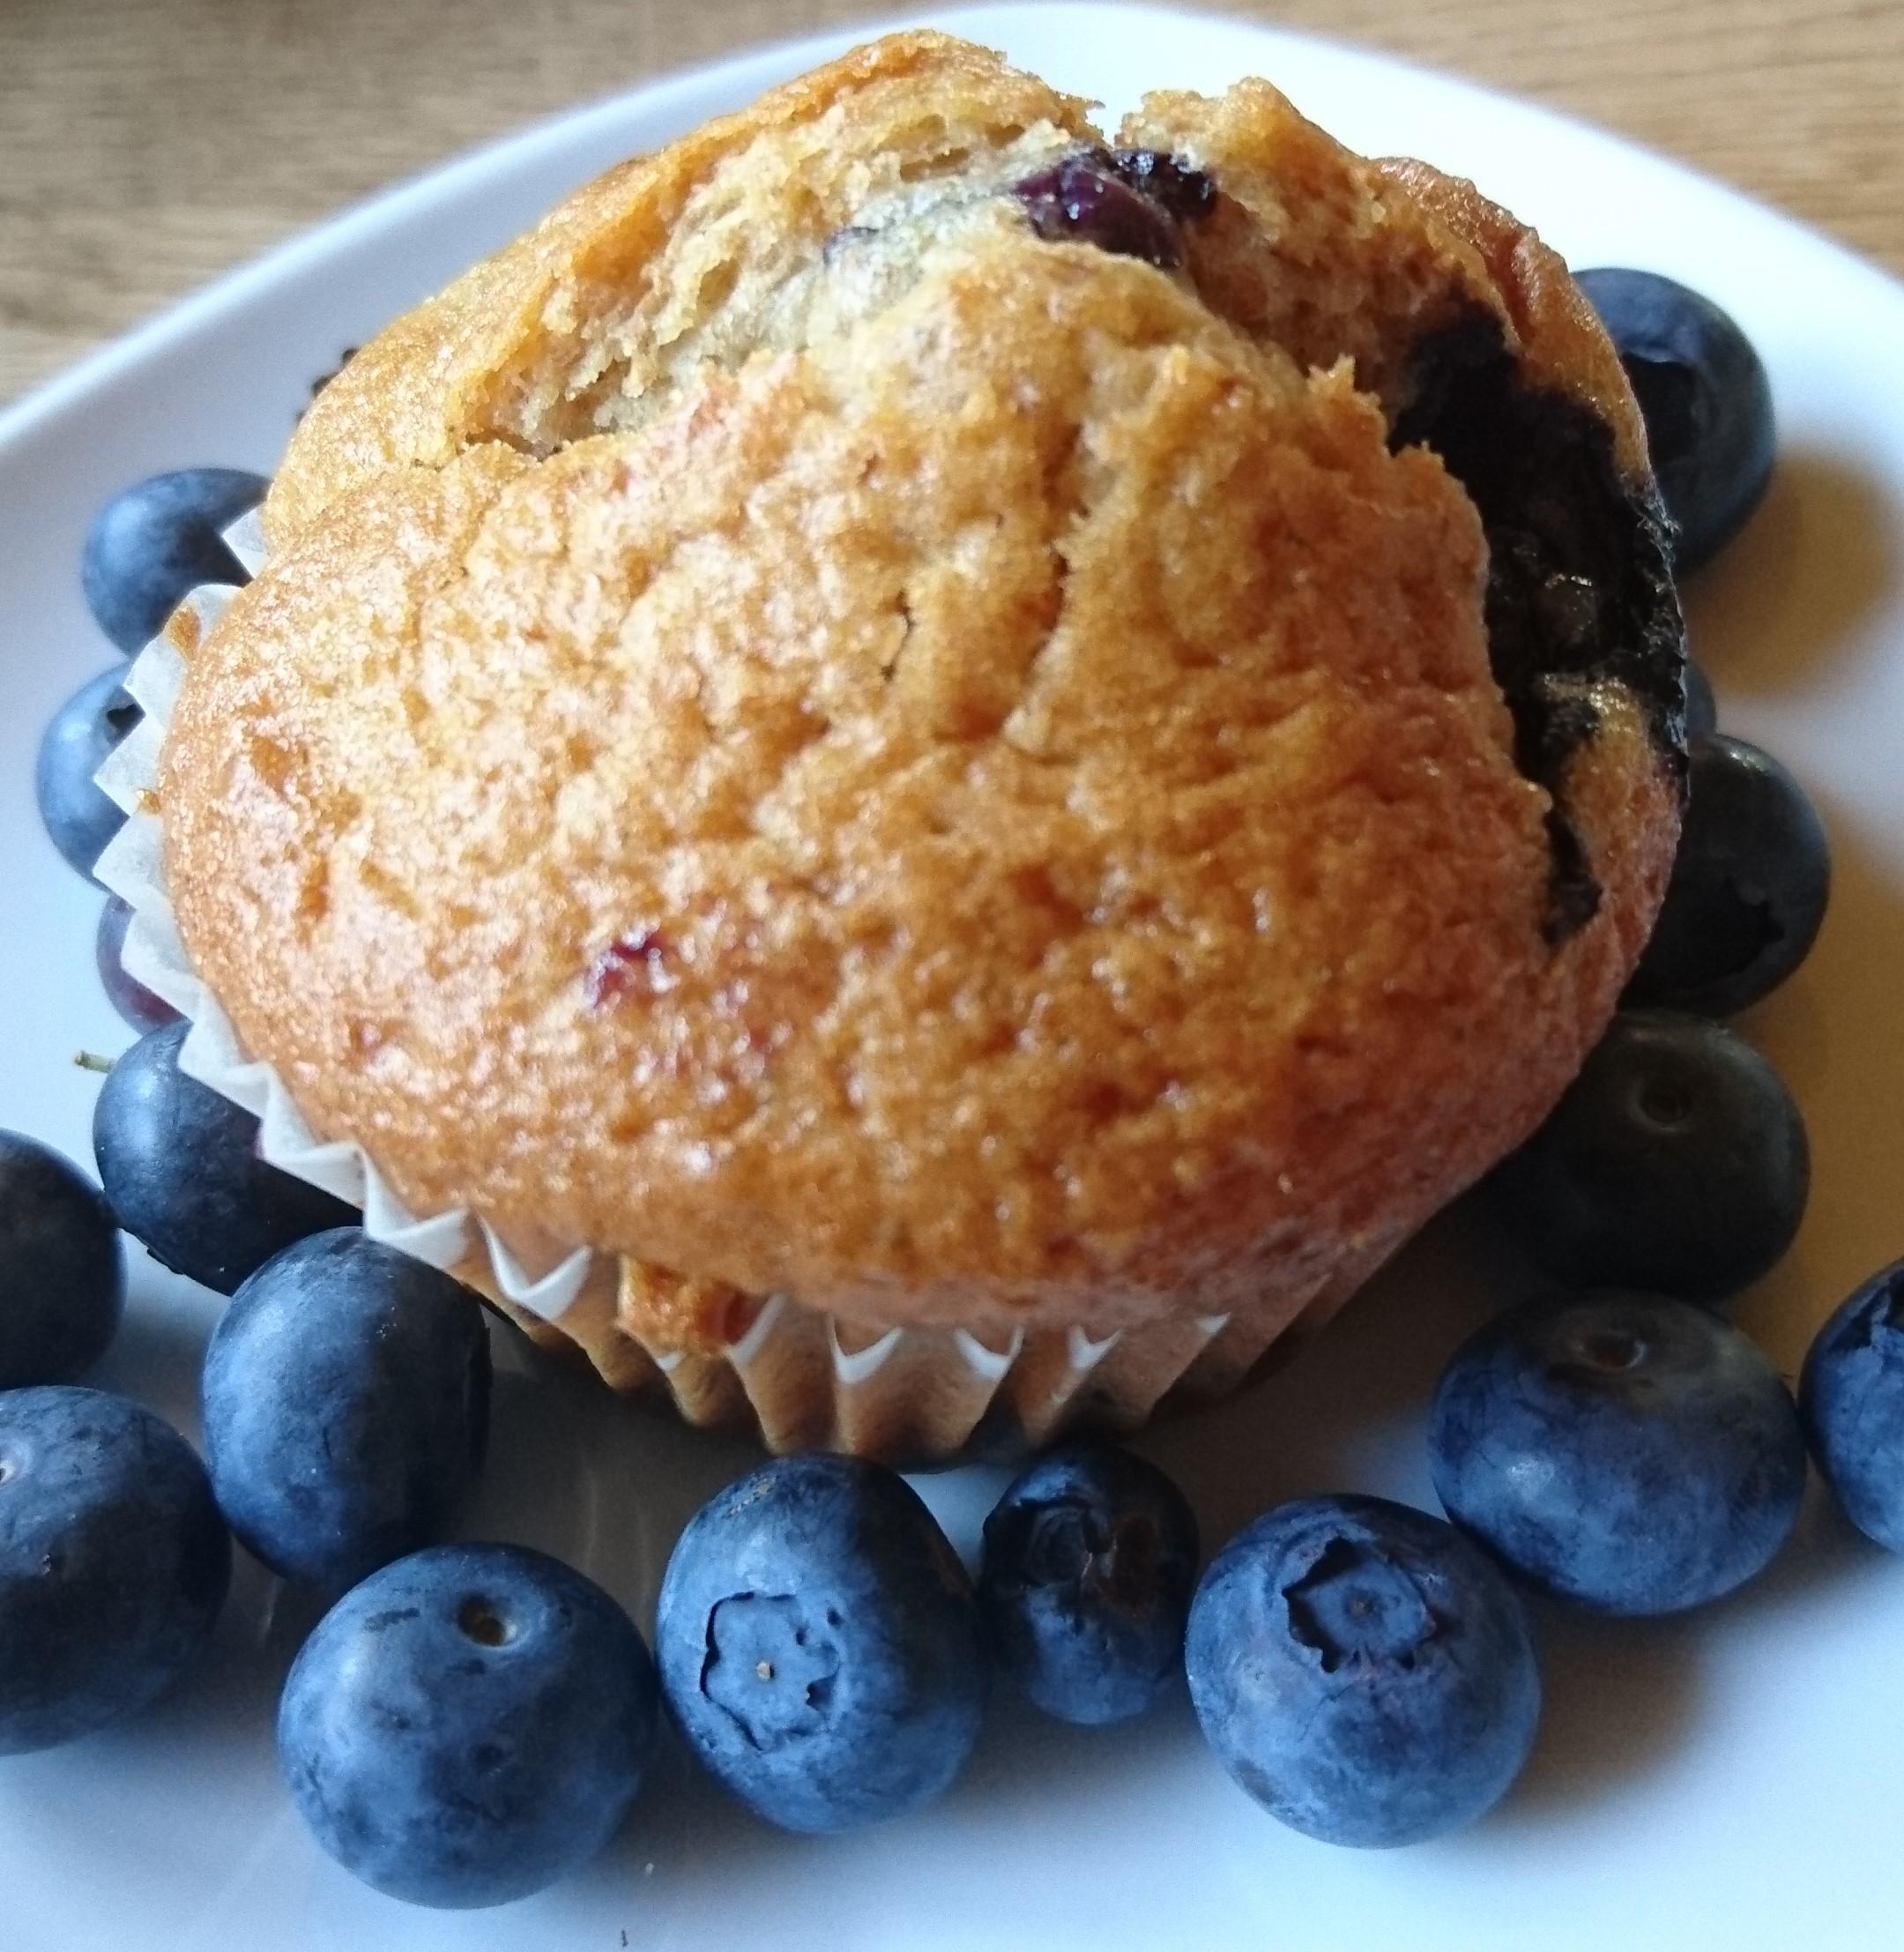 zitronige heidelbeer muffins die gourmetlette. Black Bedroom Furniture Sets. Home Design Ideas